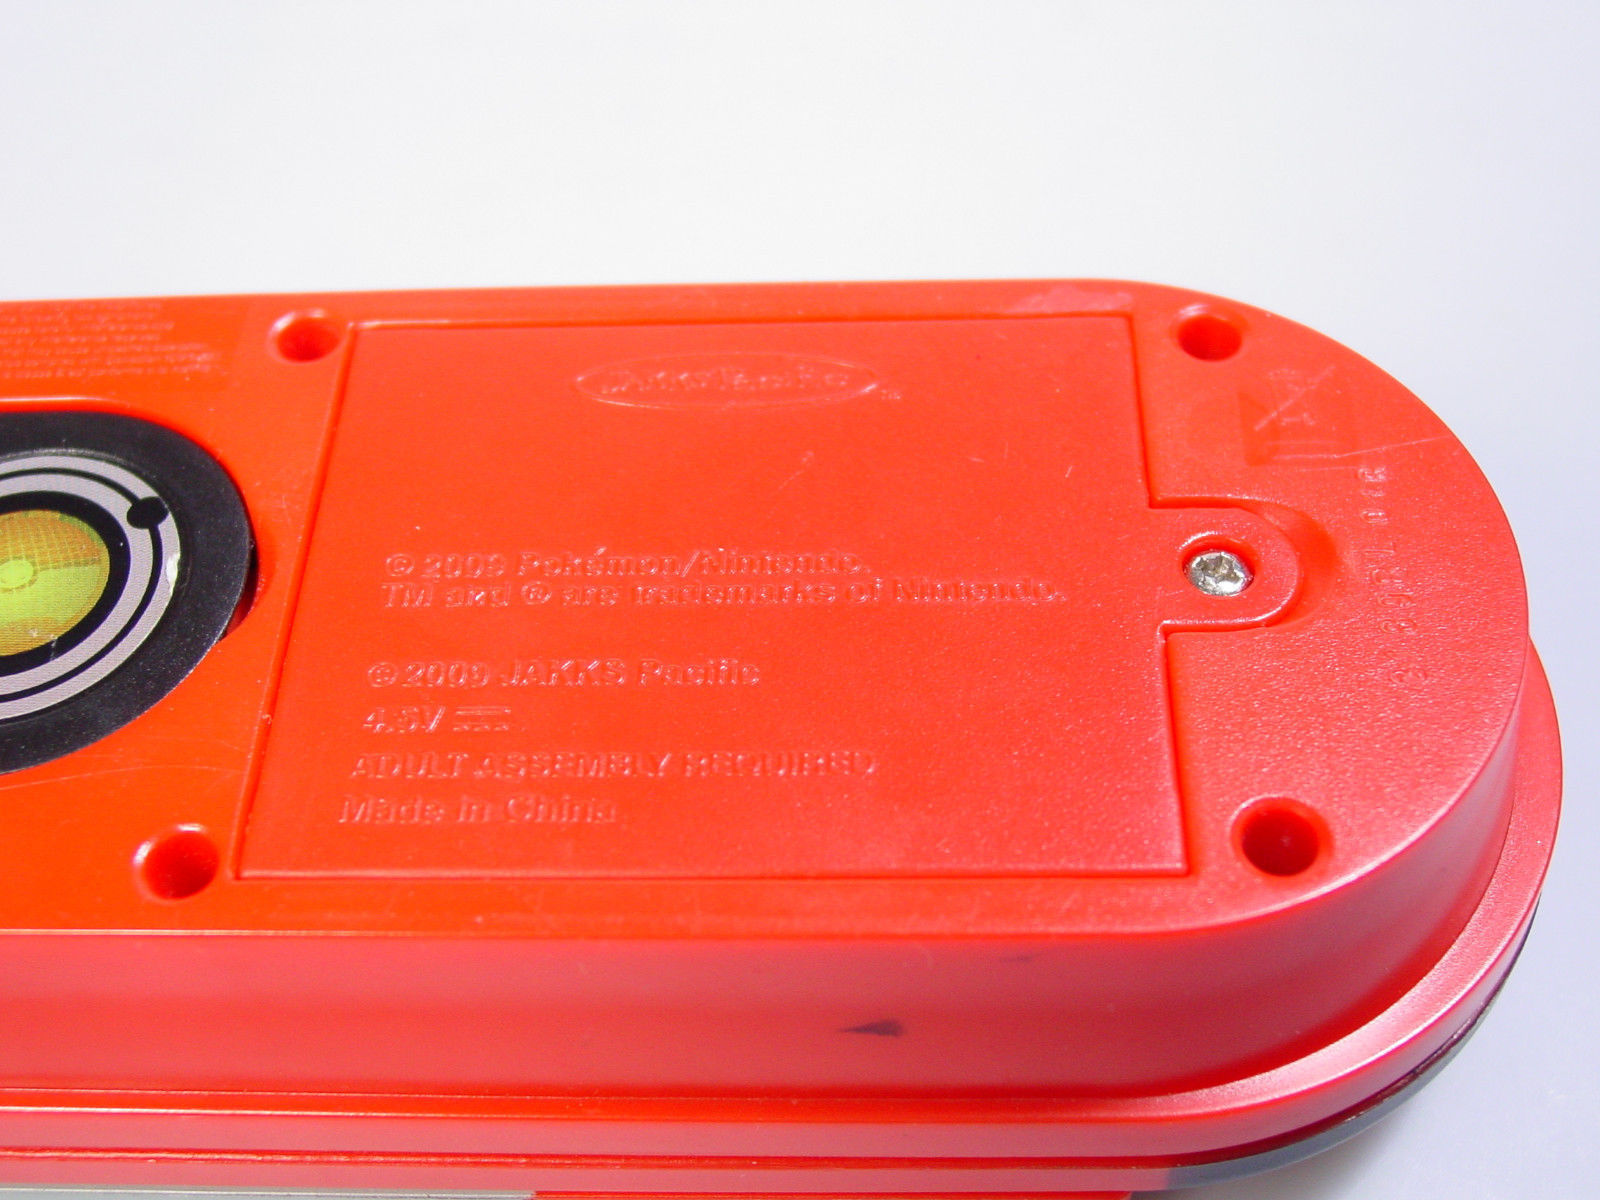 Nintendo Pokemon Electronic Game Hand Held Portable Jakks Pacific